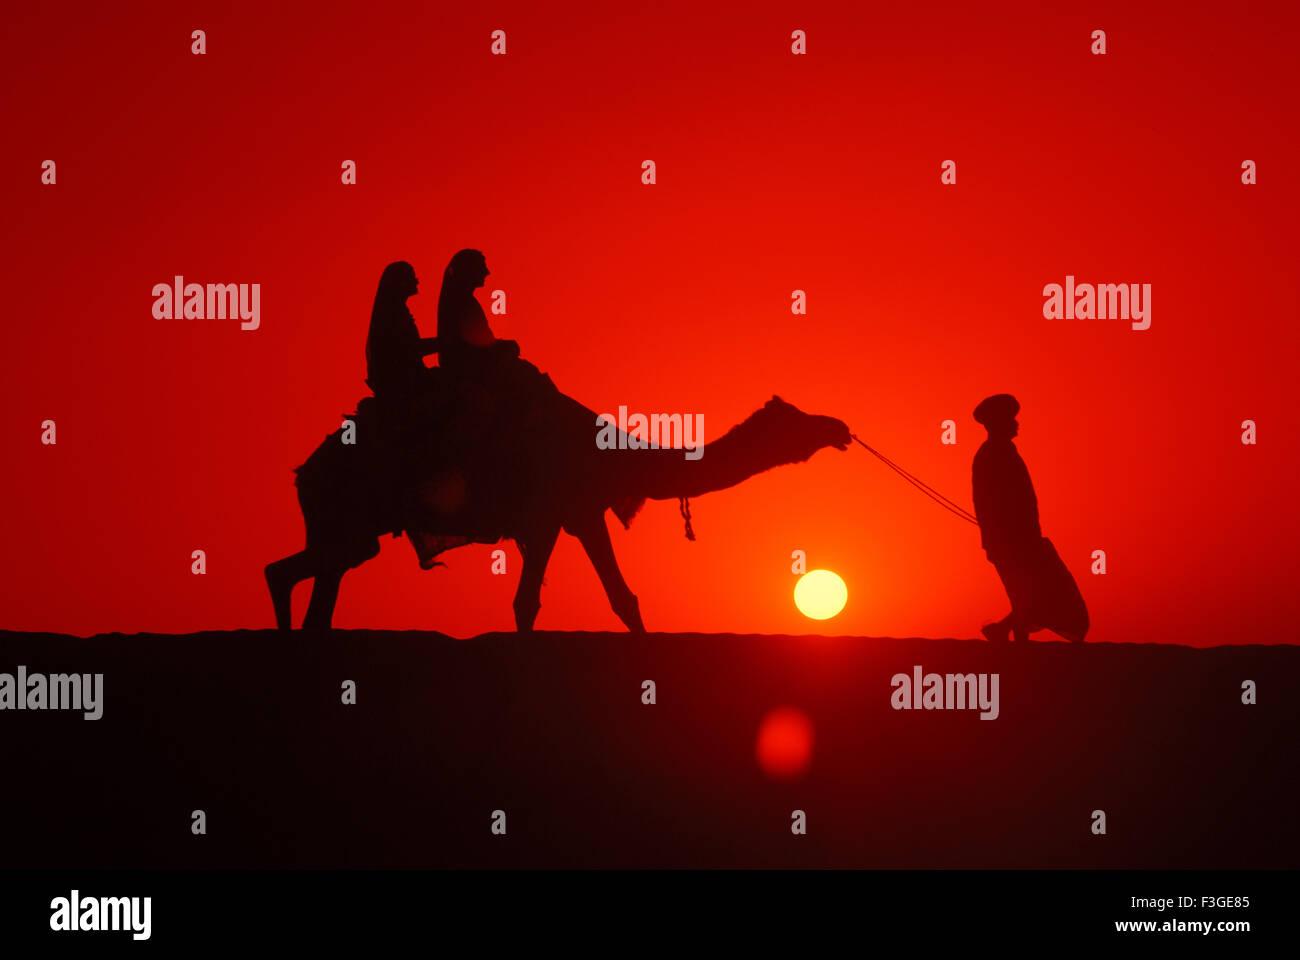 Man with camel walking in evening glory ; Jaisalmer; Rajasthan; India - Stock Image